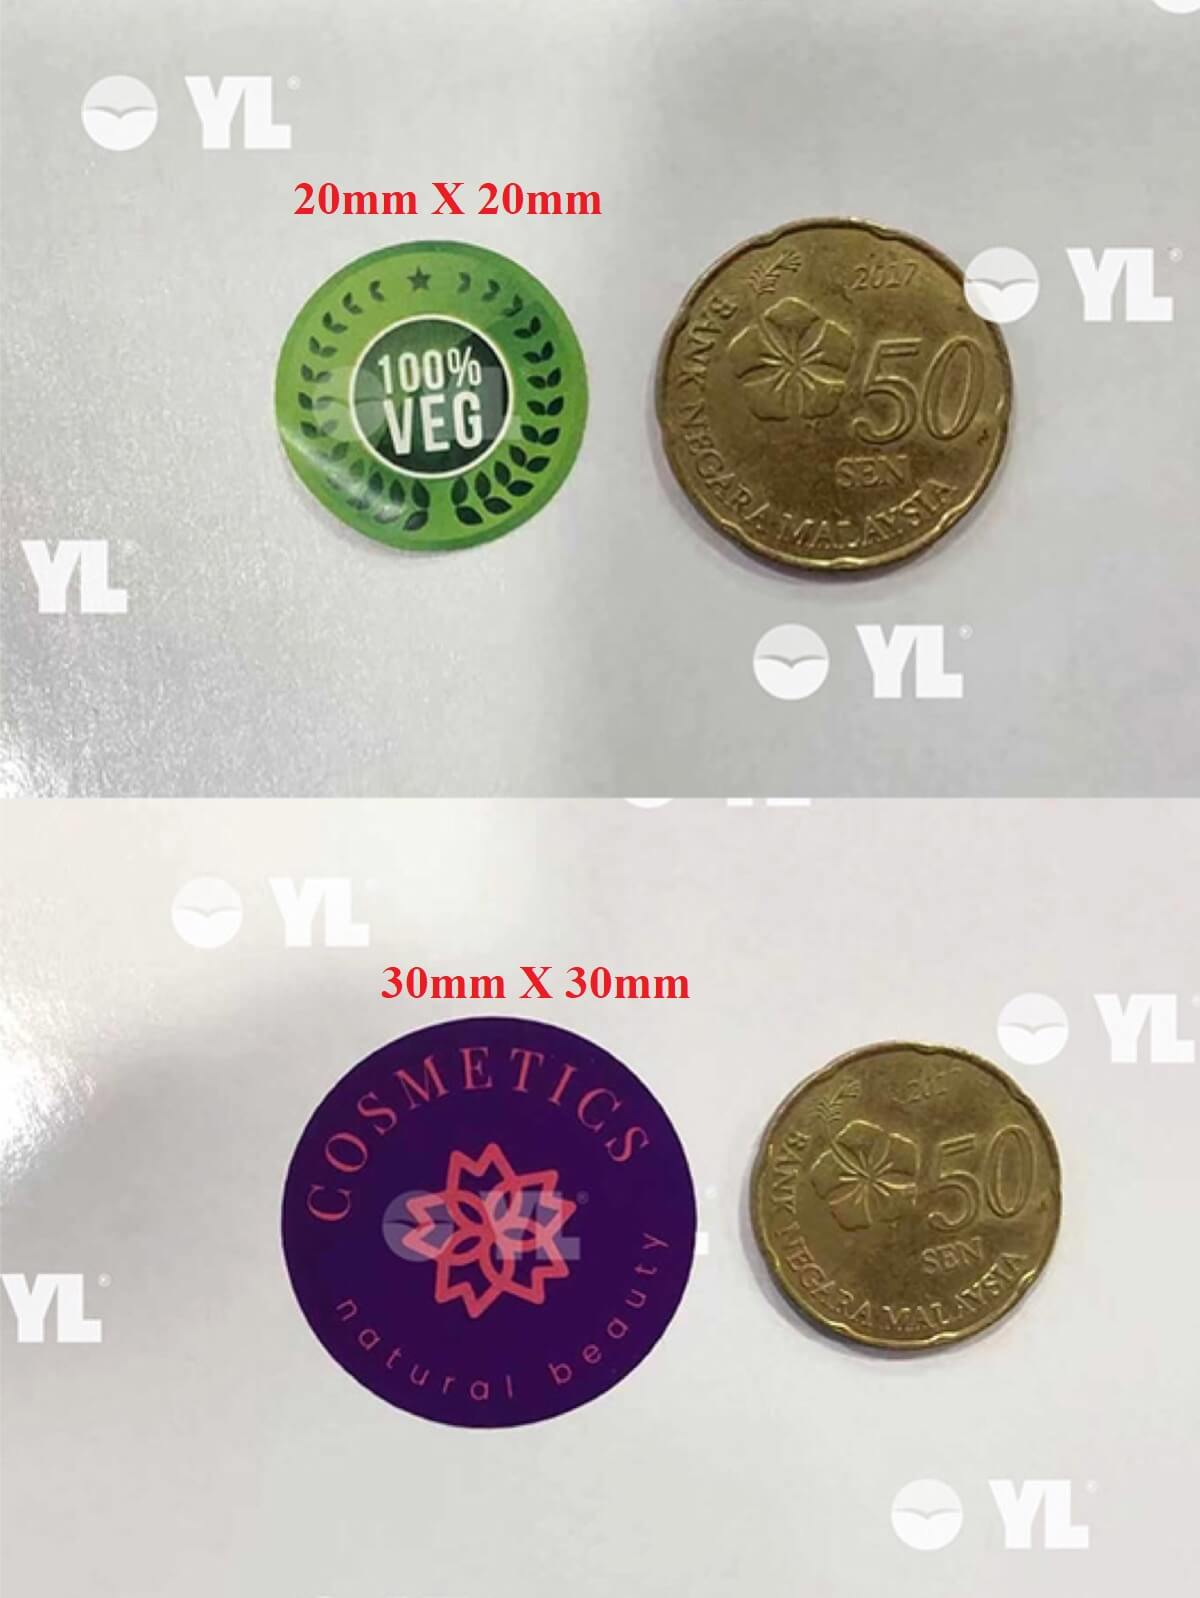 https://www.yl.com.my:449/admin/uploads/products/09364ca9-1926-4984-8a41-0bb61650151a/20mm-30mm_3275.jpg